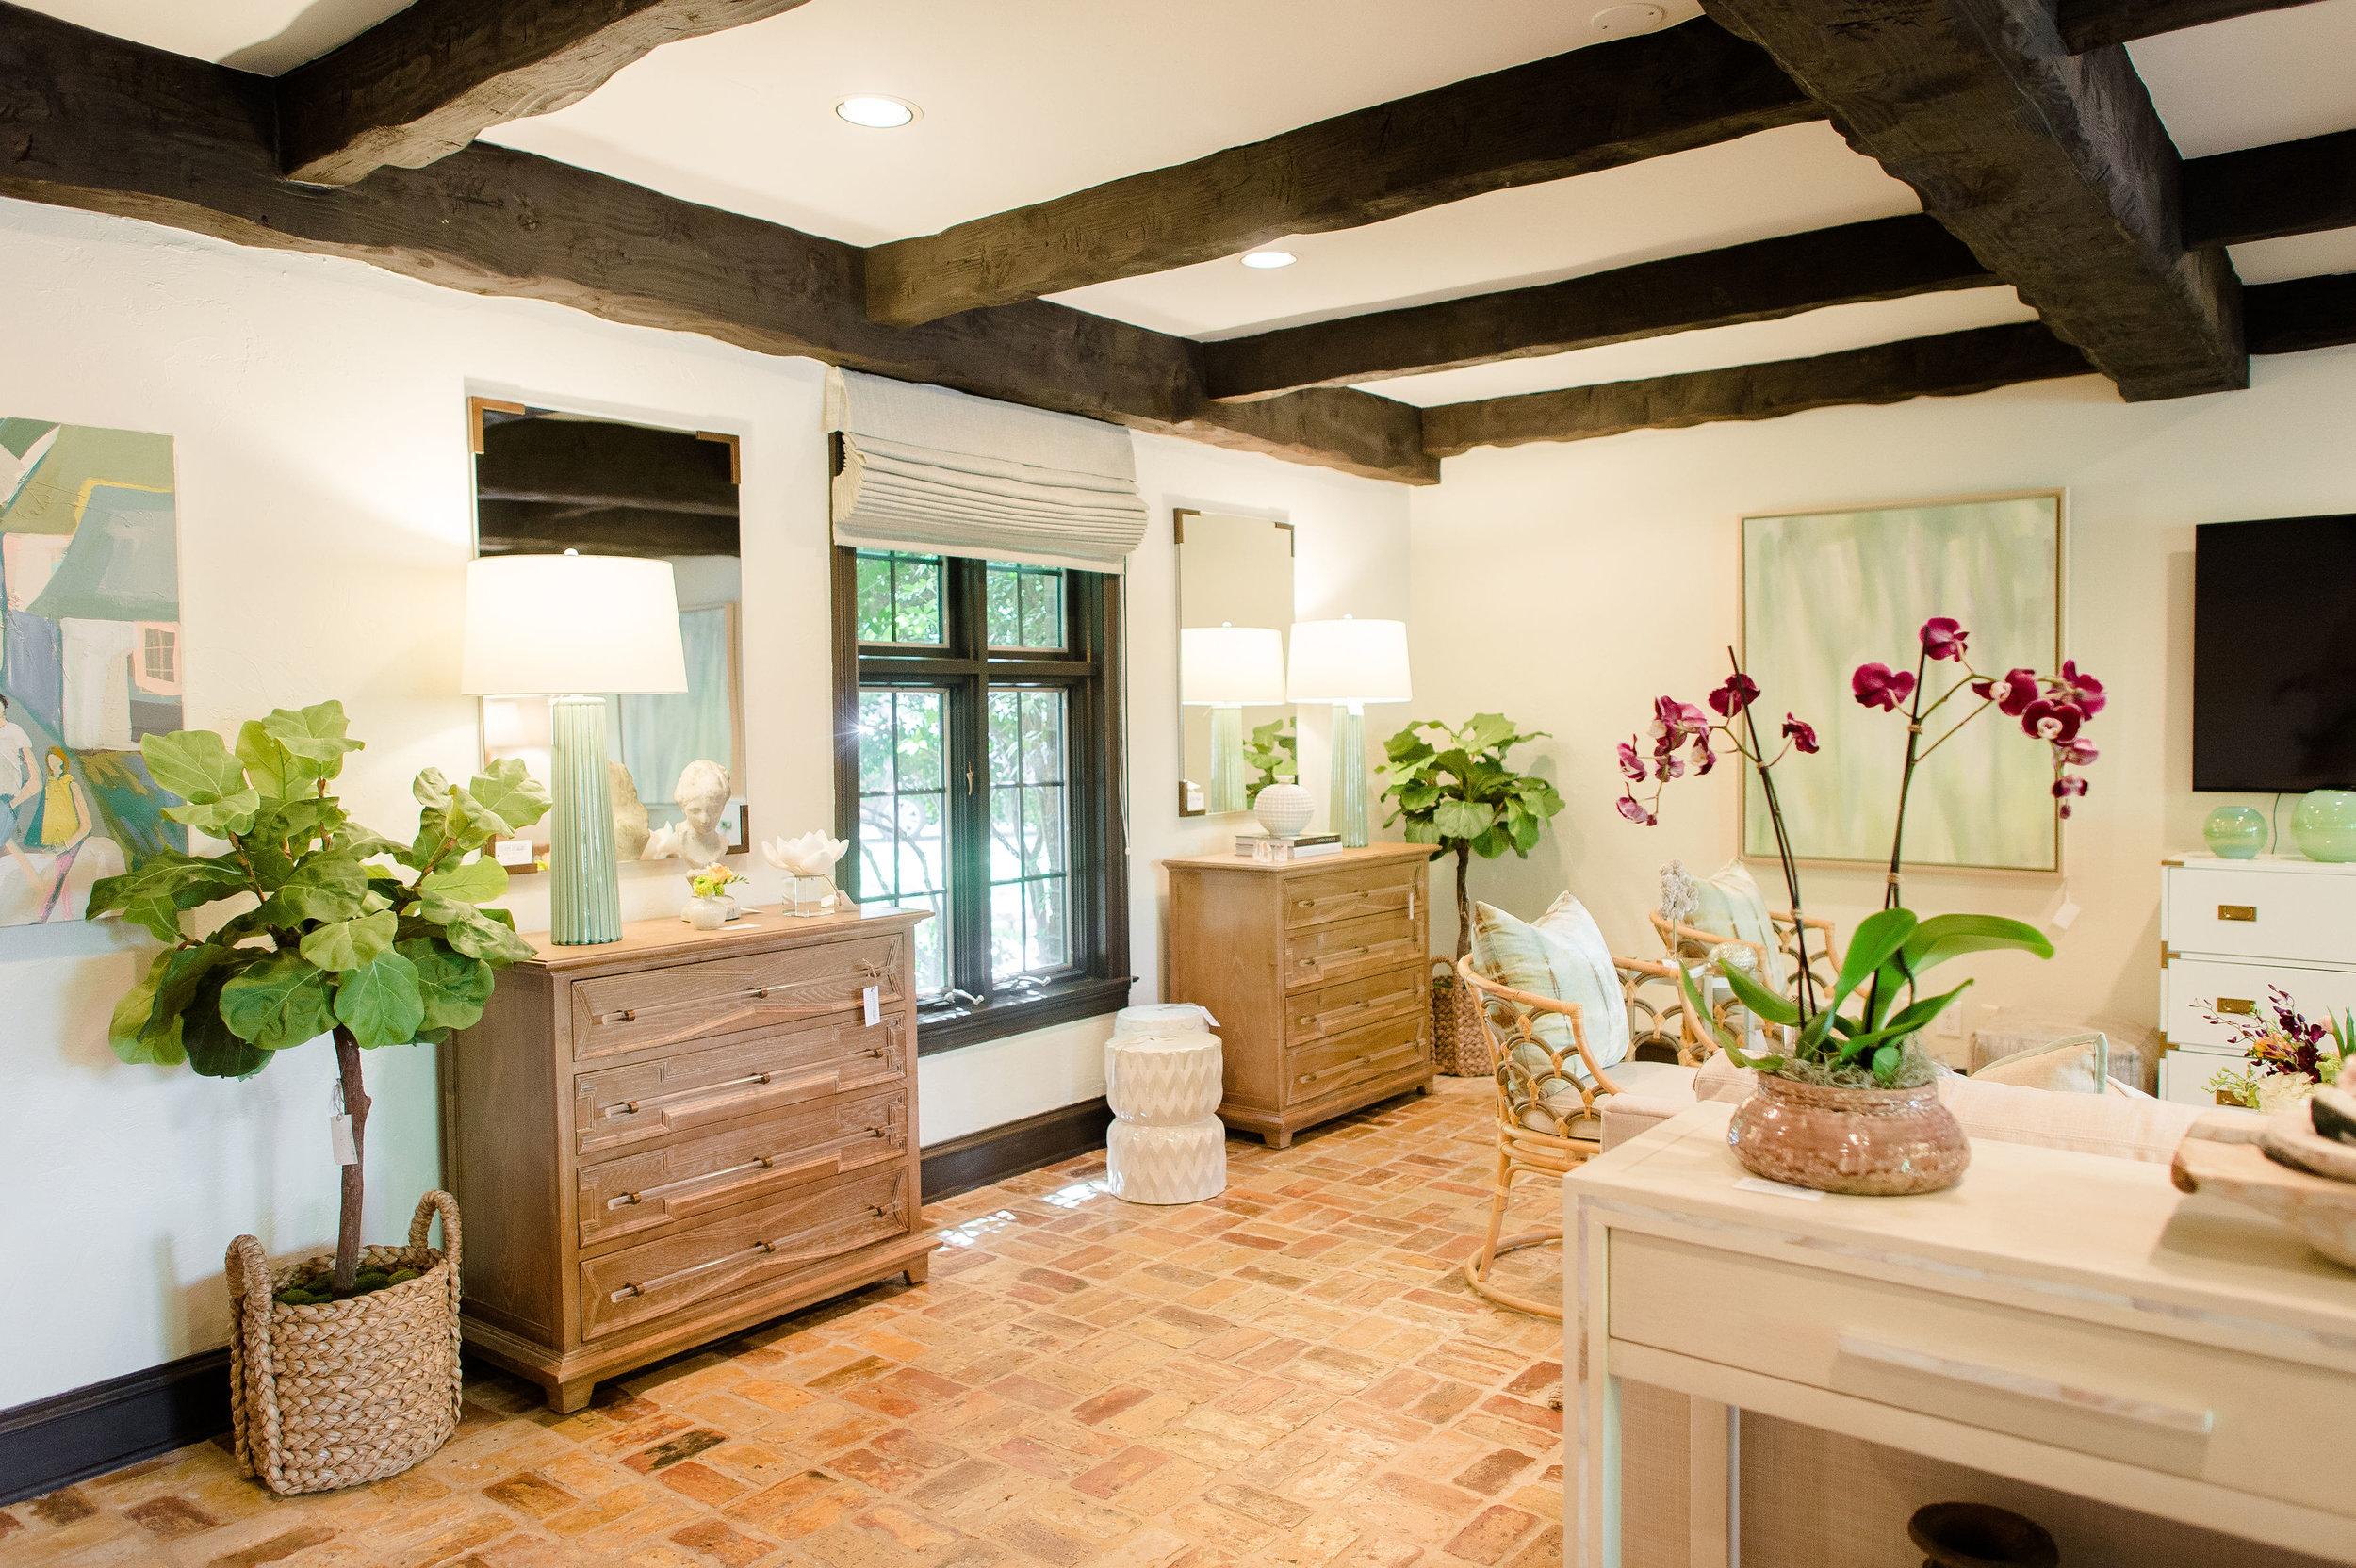 clark-design-studio-mirrors-natural-light.jpg